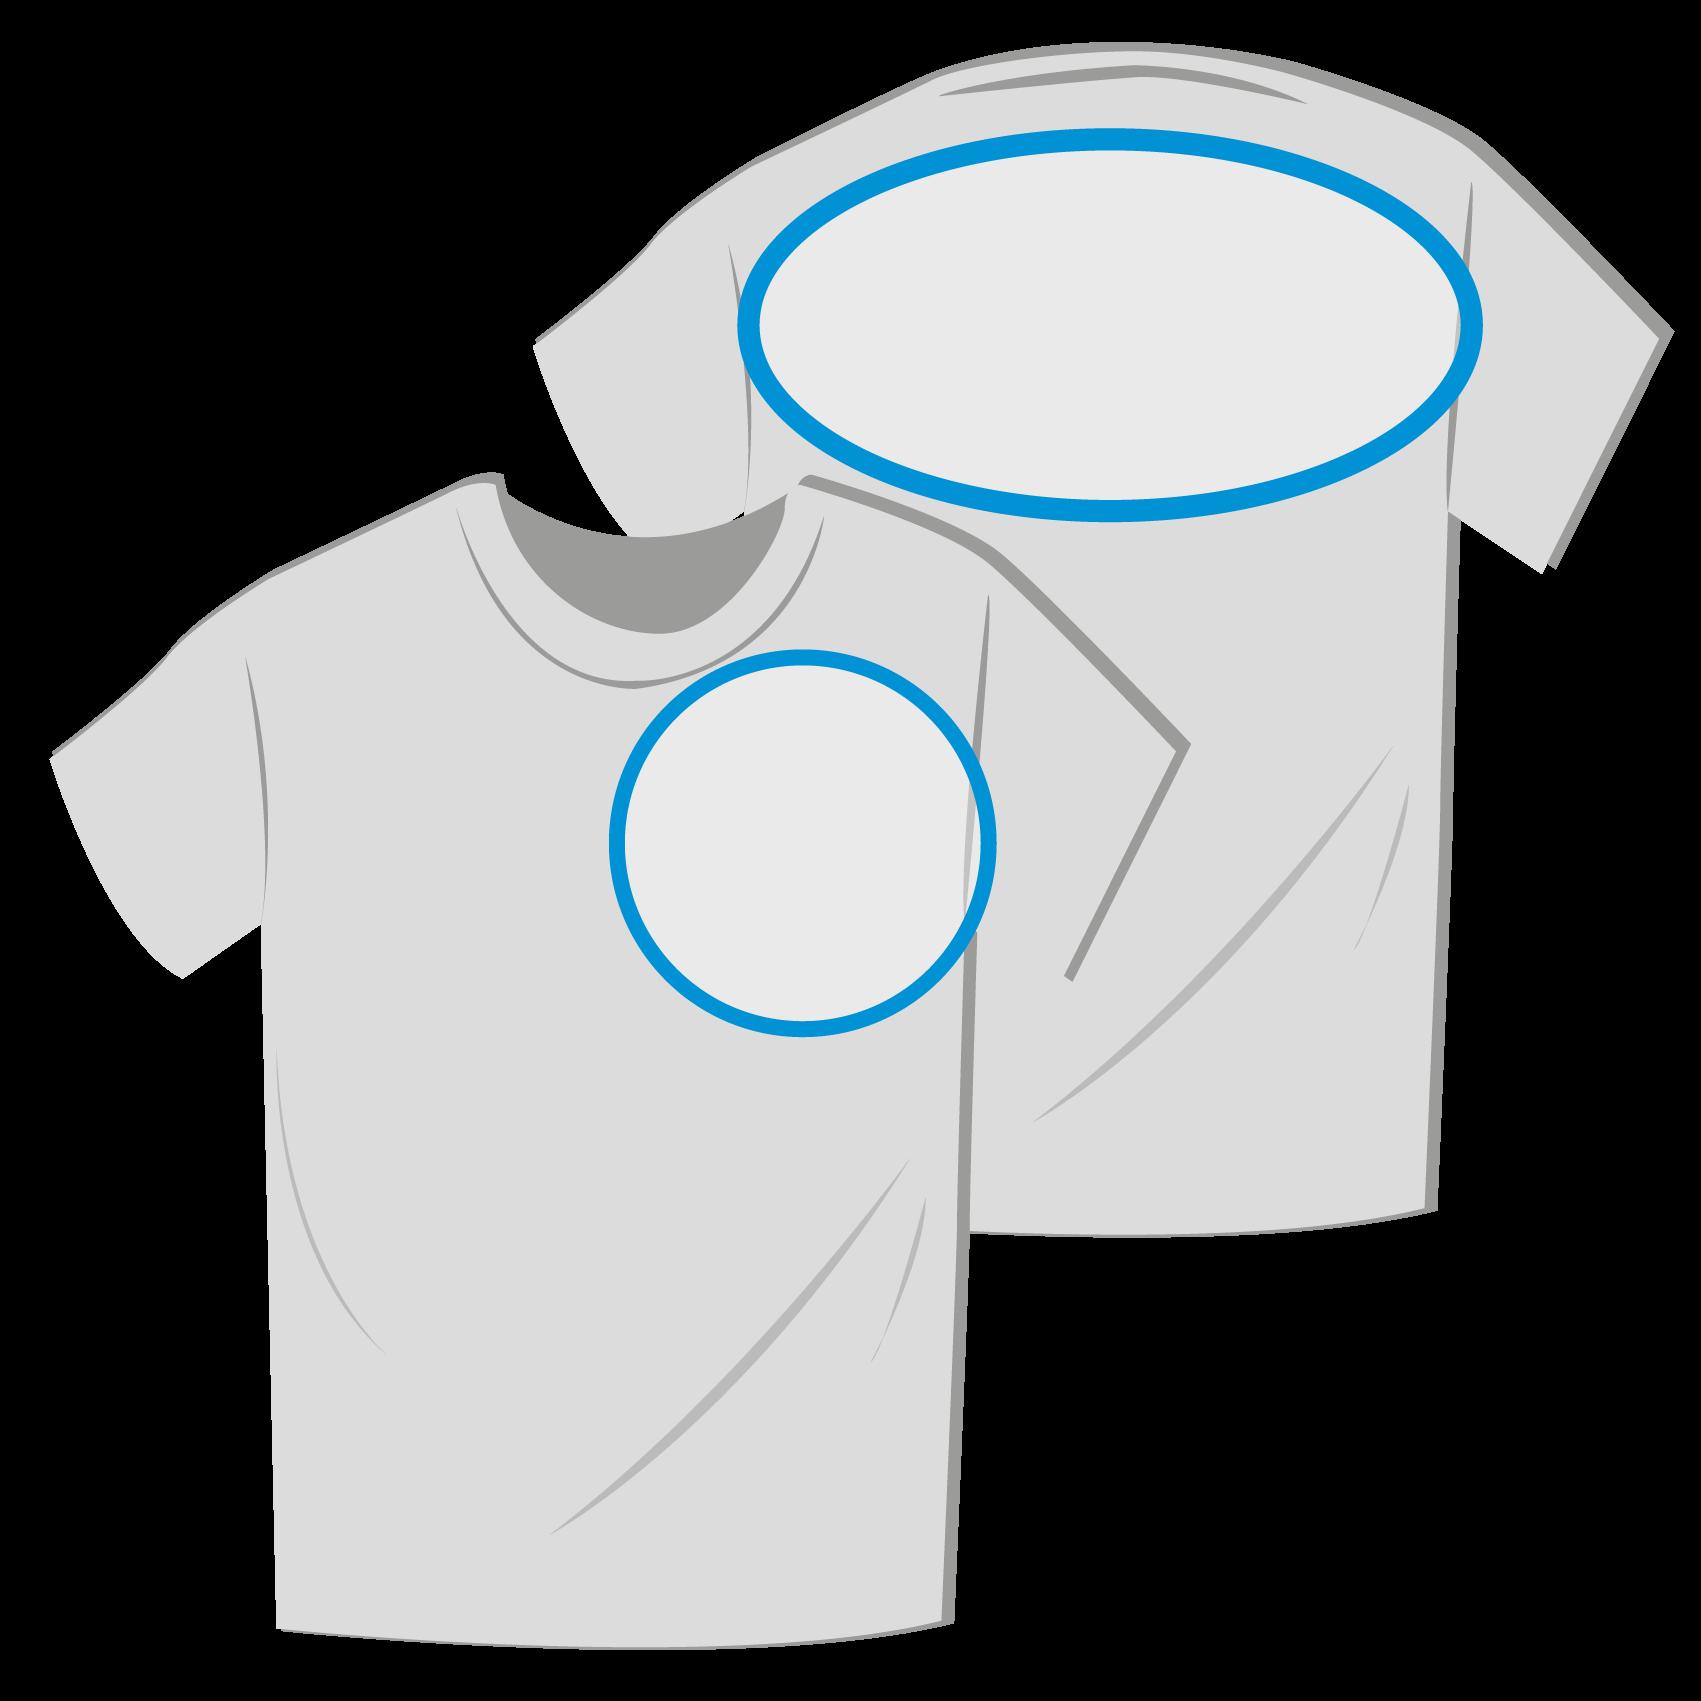 Signaal Bedrijfkleding - Pakket Normaal